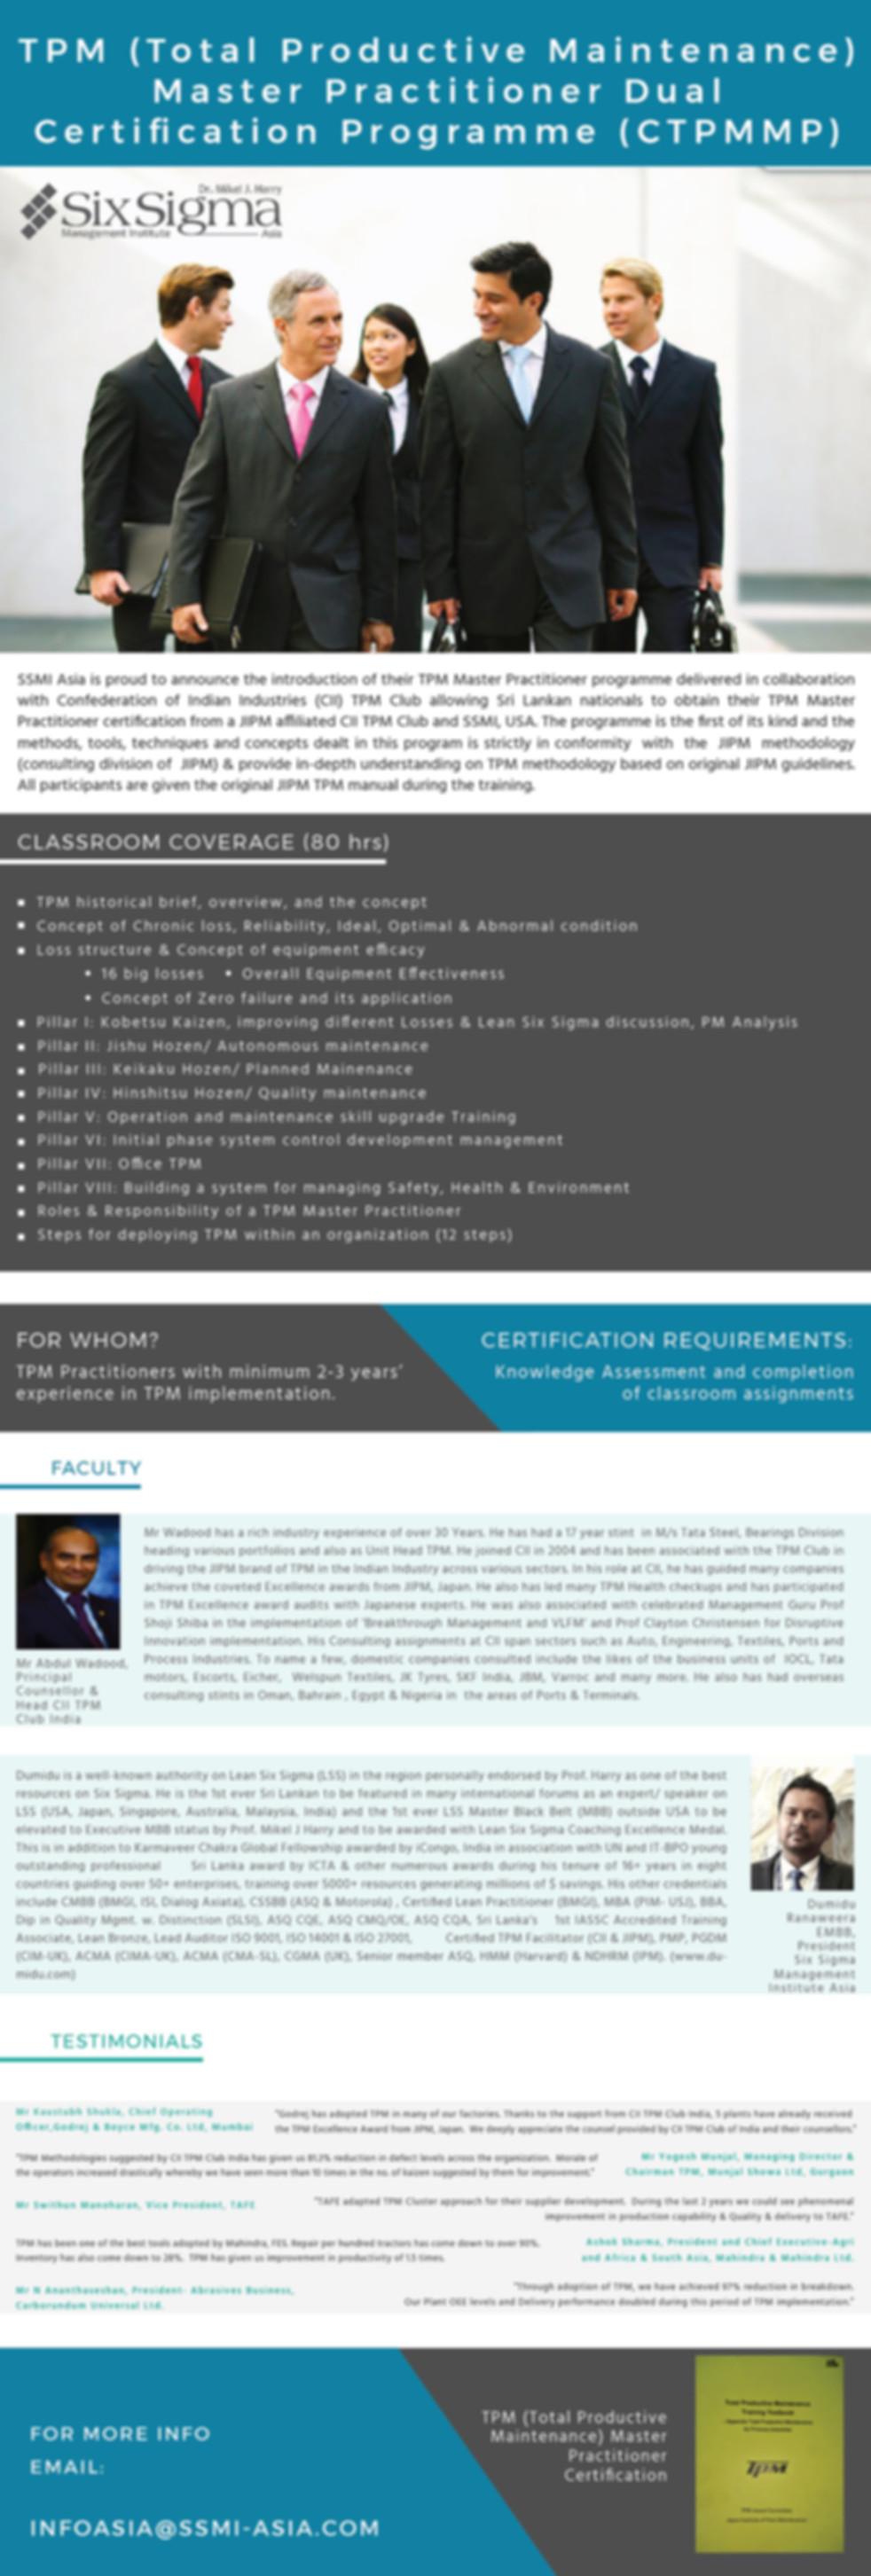 JIPM TPM Master Practitoner Progrmme